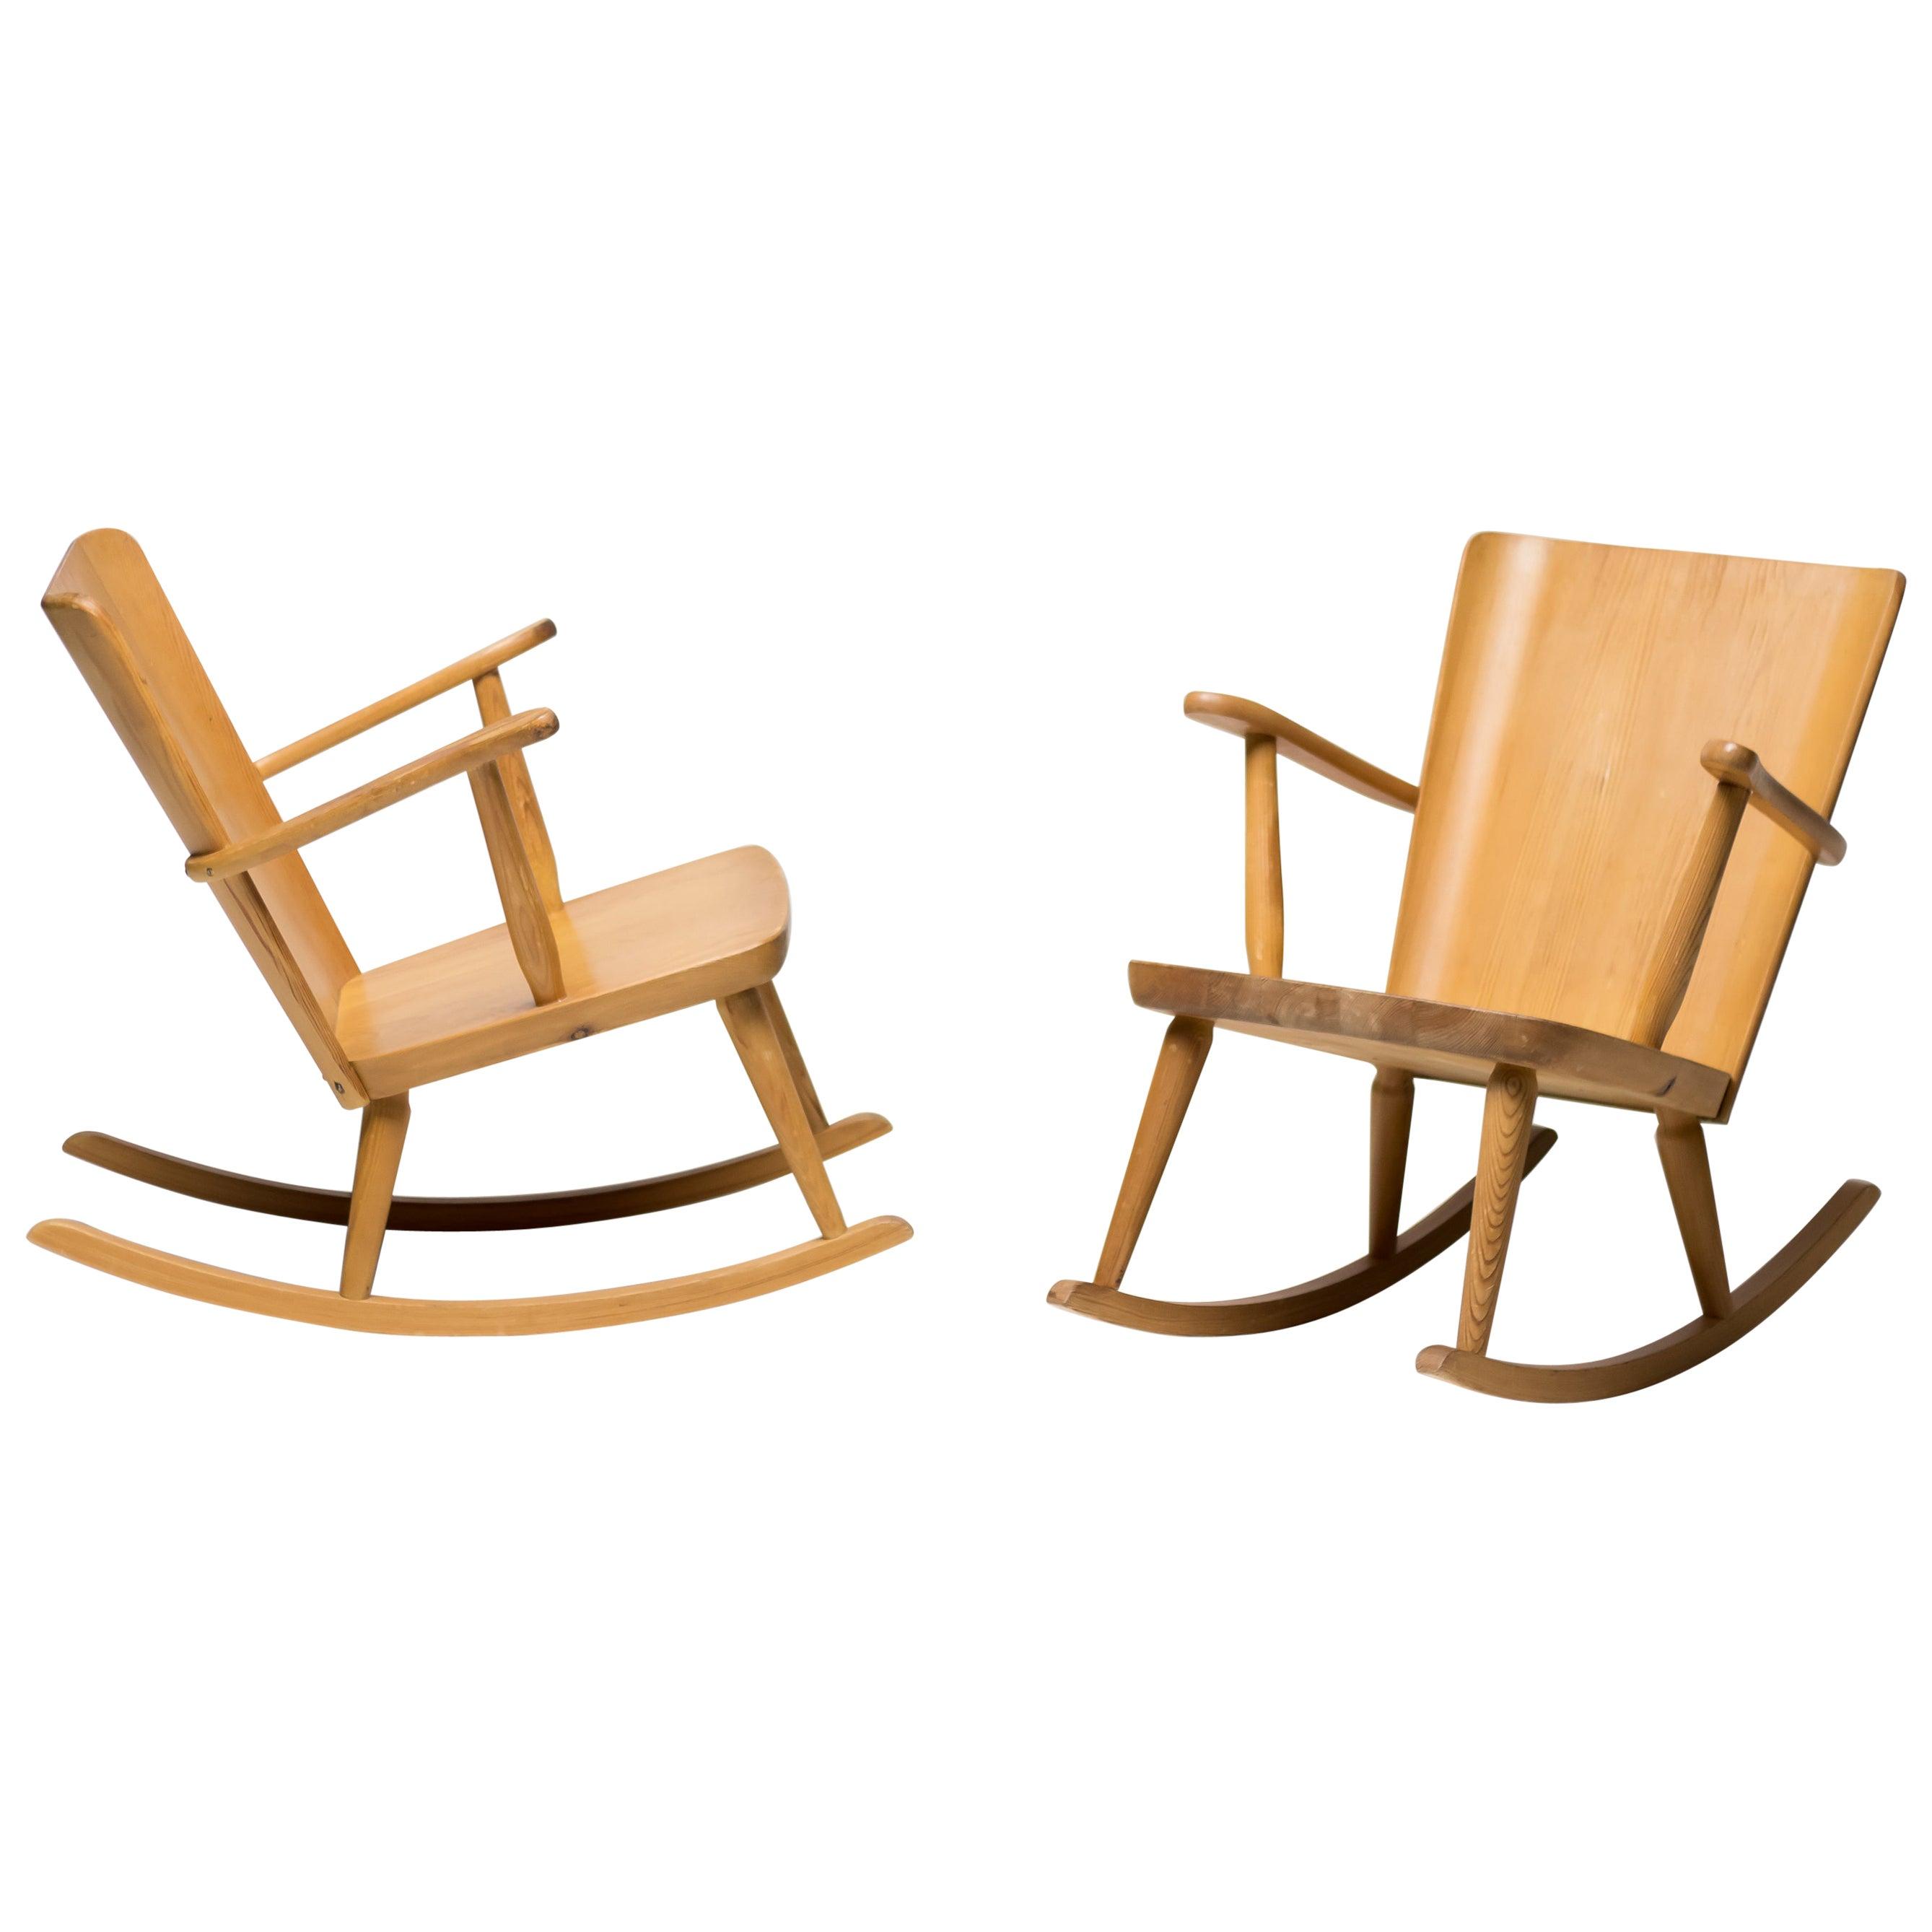 Pair of Scandinavian Pine Rocking Chairs